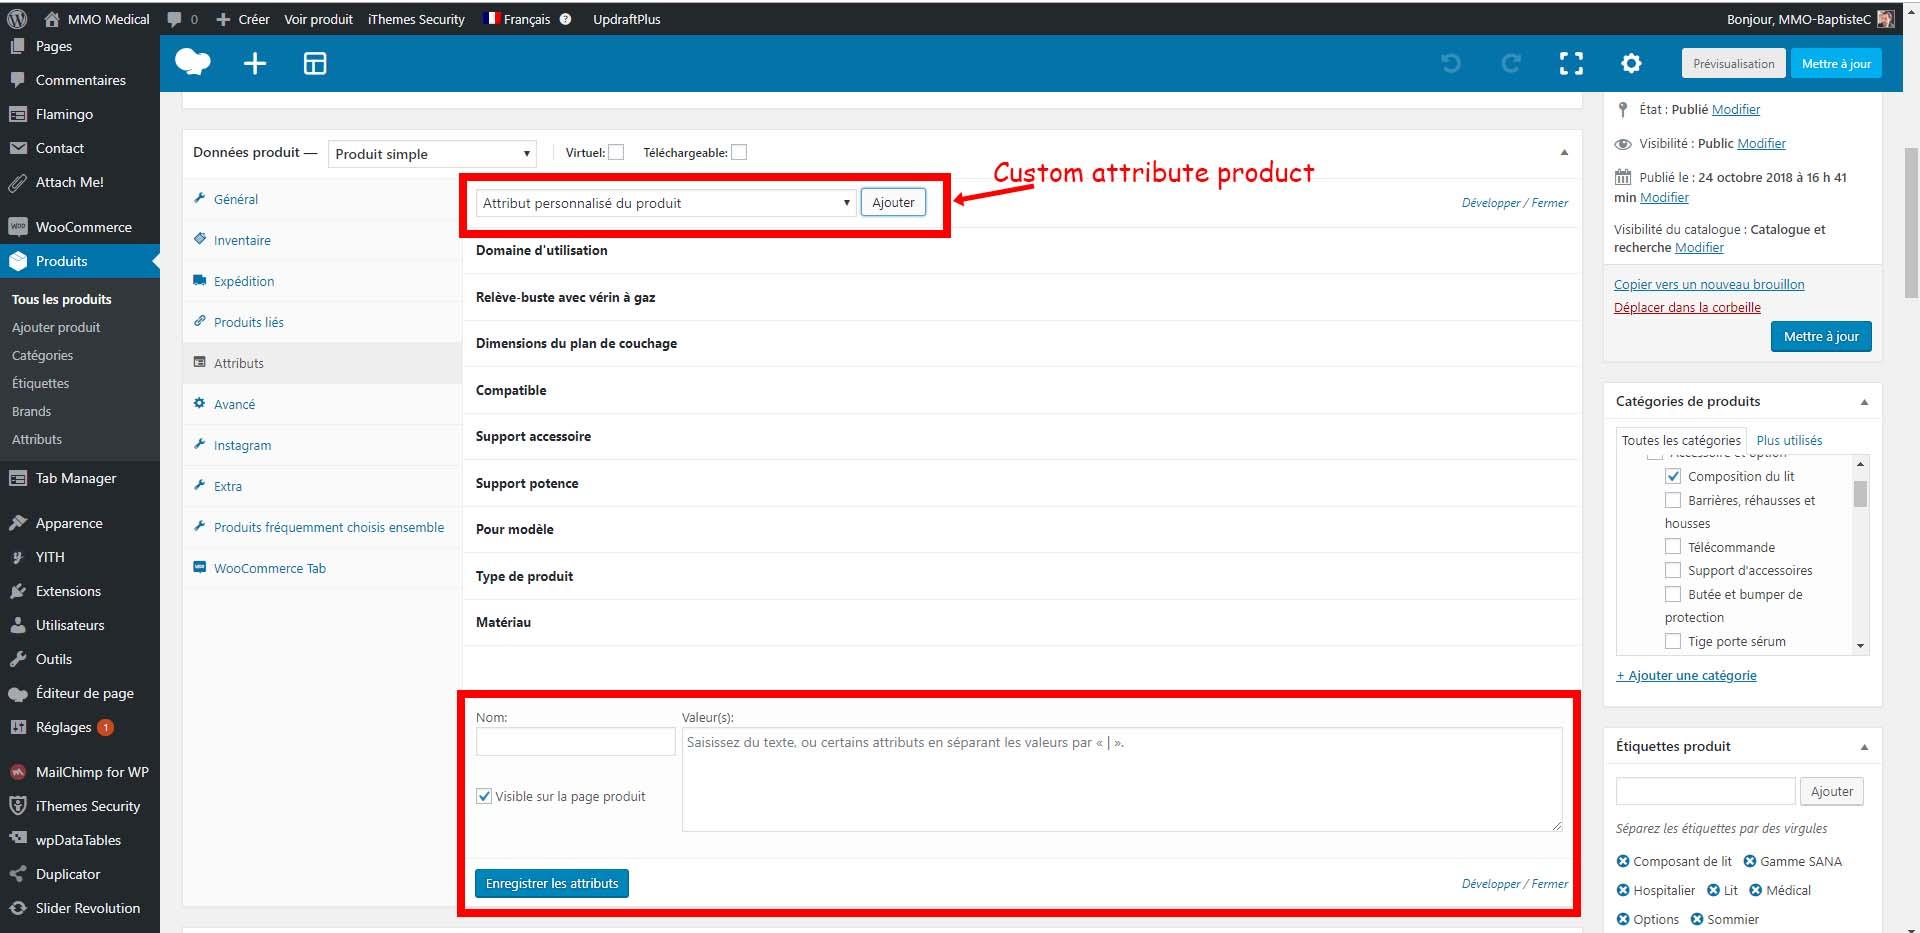 2018.11.27_Custom attribute product translation.jpg